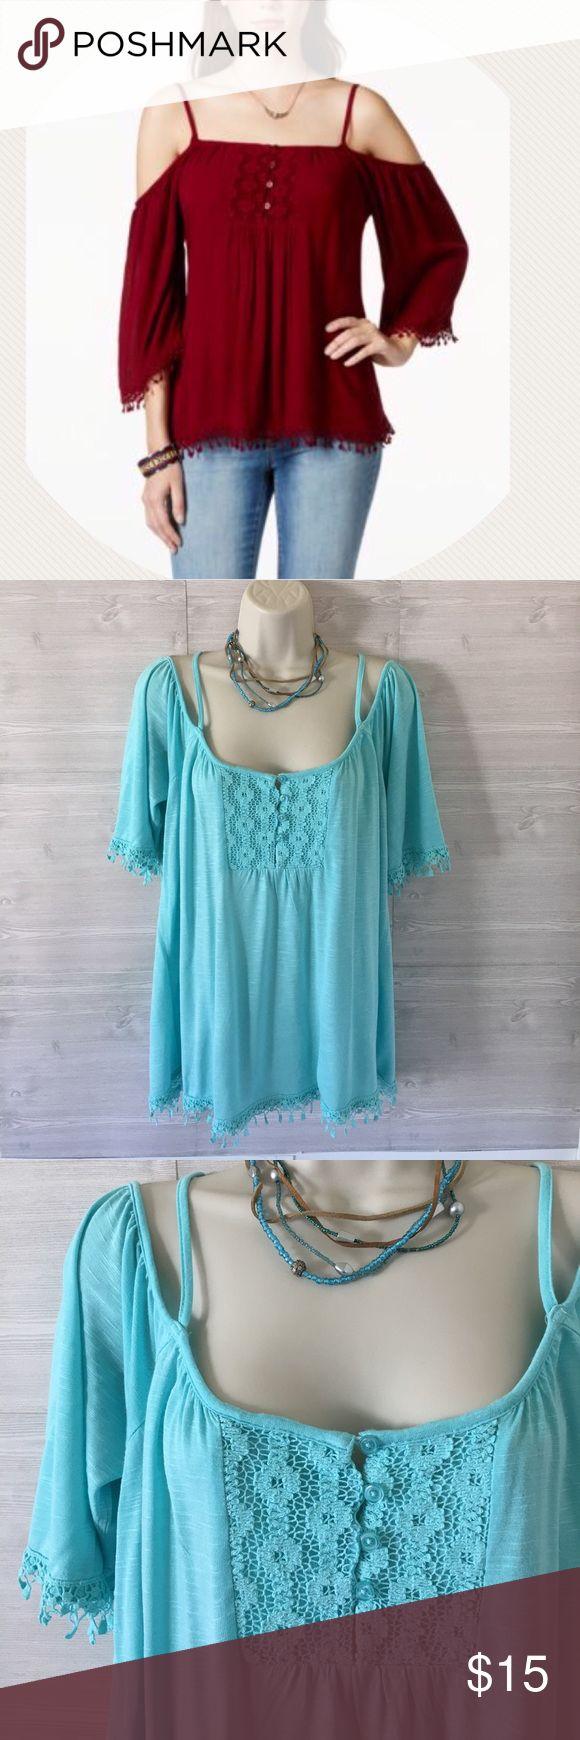 American Rag cie** top Adjustable strap, cold shoulder top. Aqua blue. Get ready for the summer! American Rag Tops